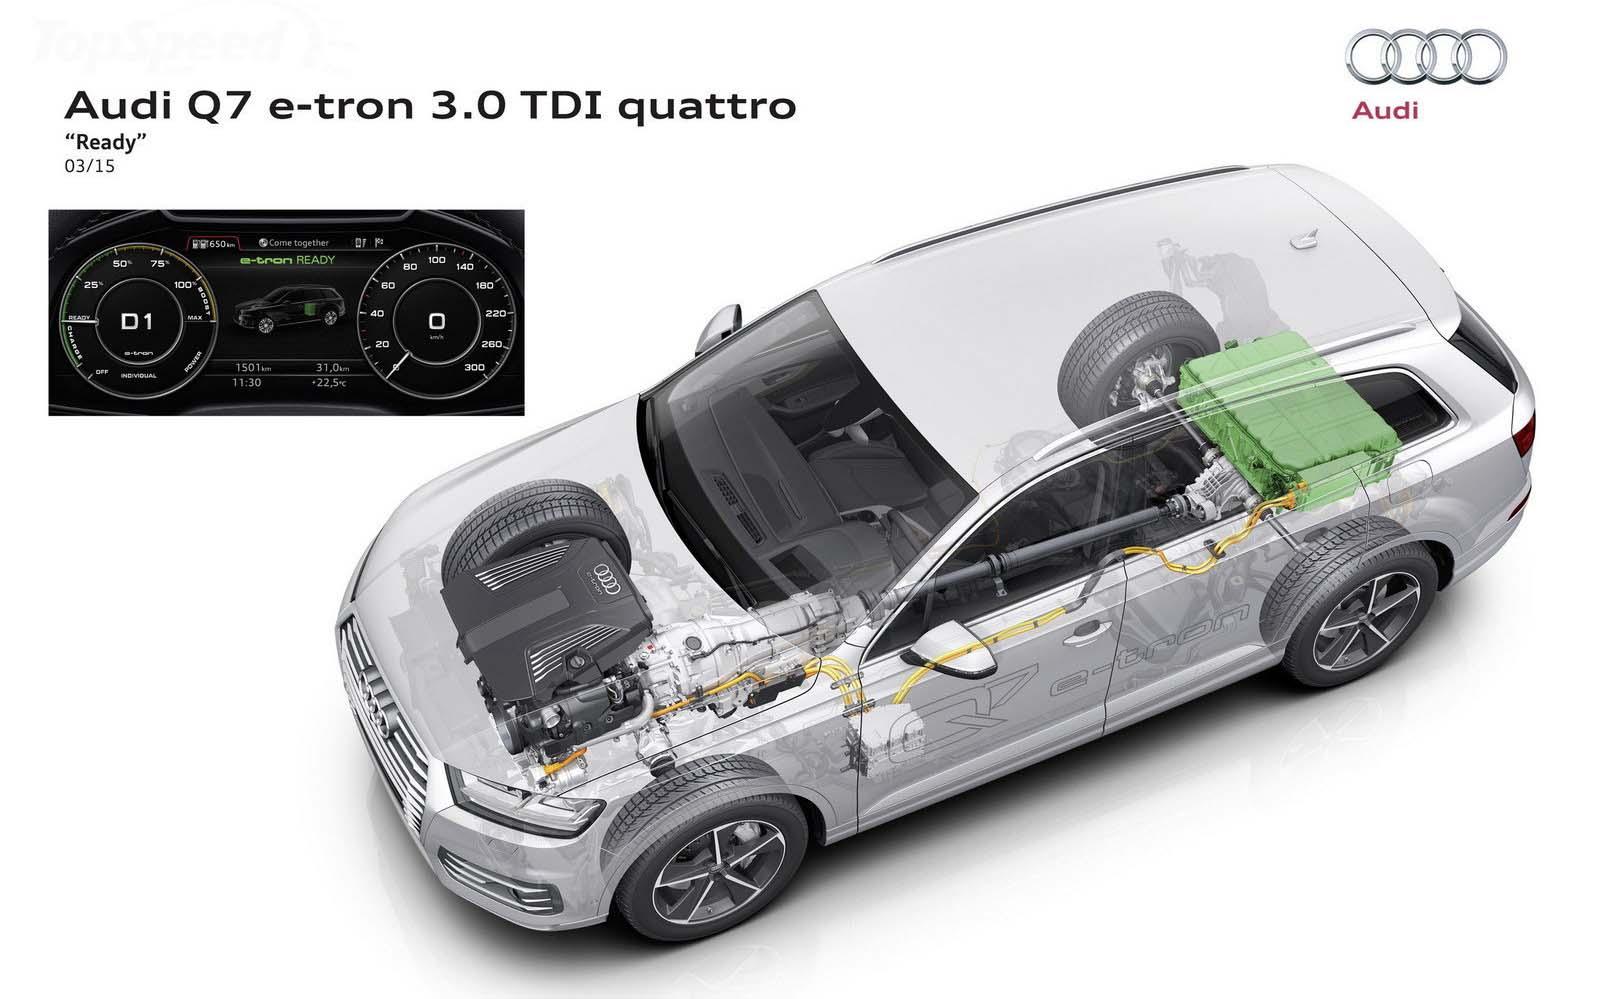 Audi-Q7-e-tron-quattro caracteristicas mecanicas